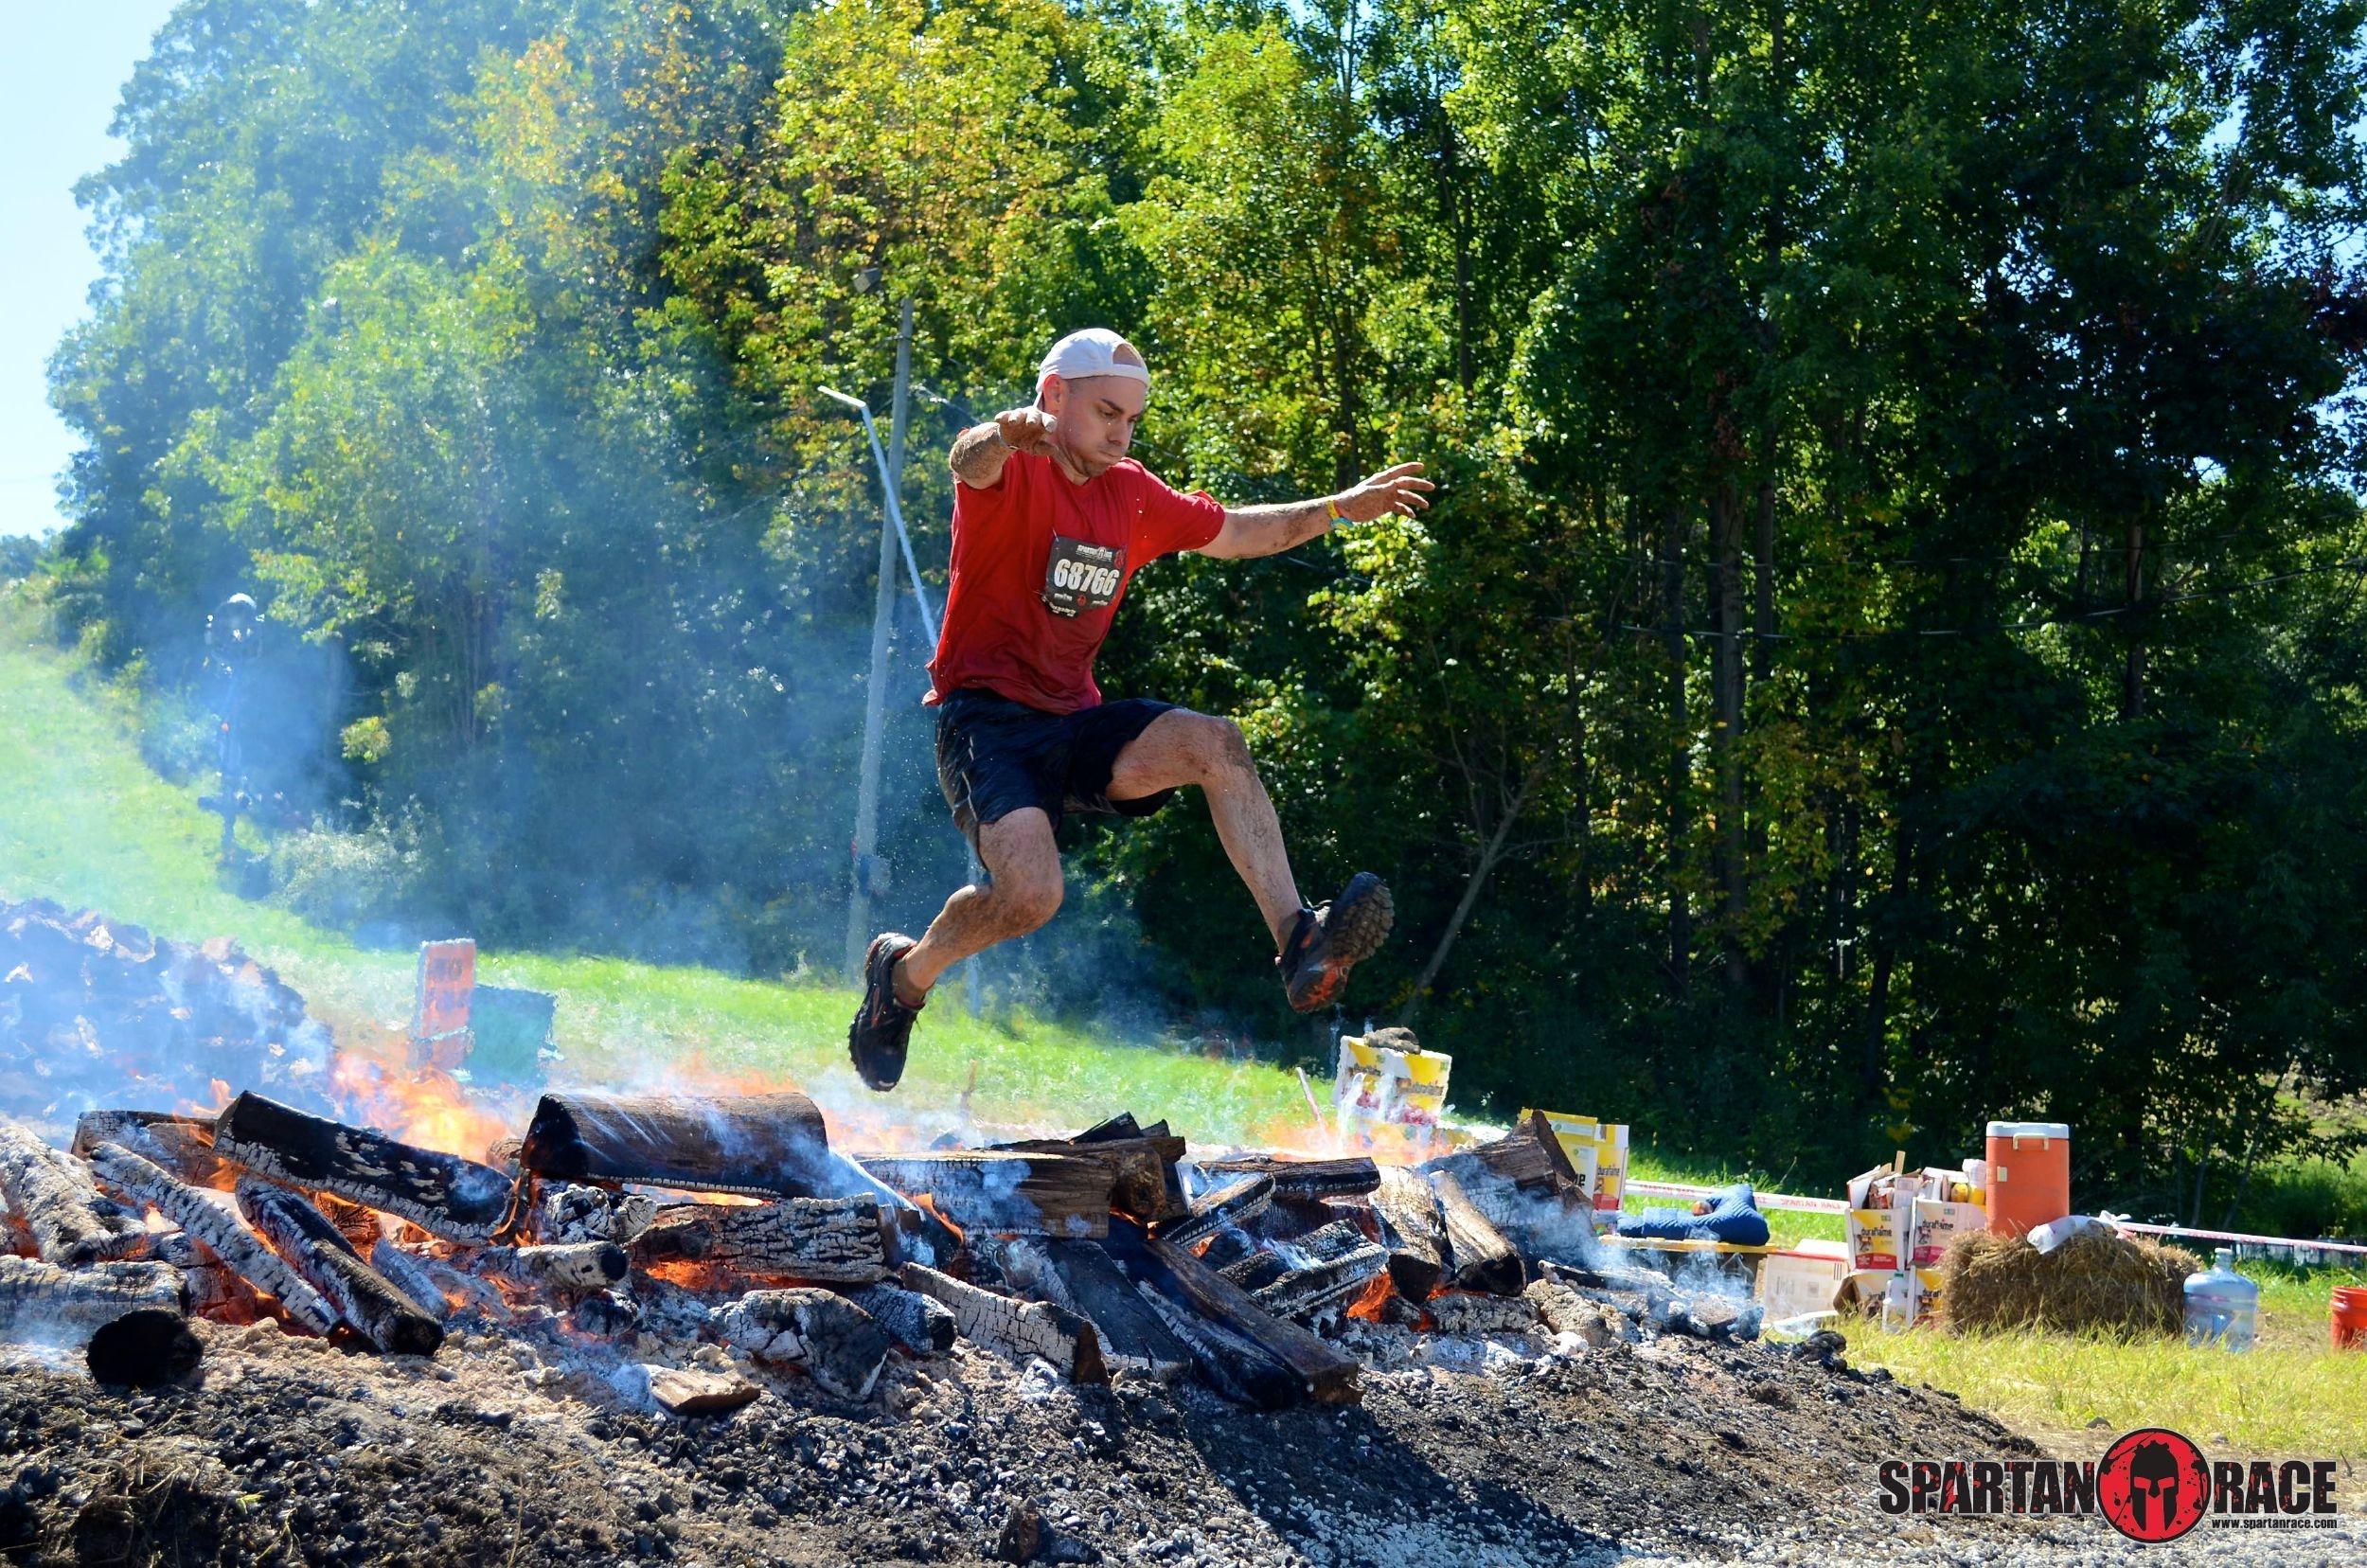 Spartan Fire - Dan - Sep 2012